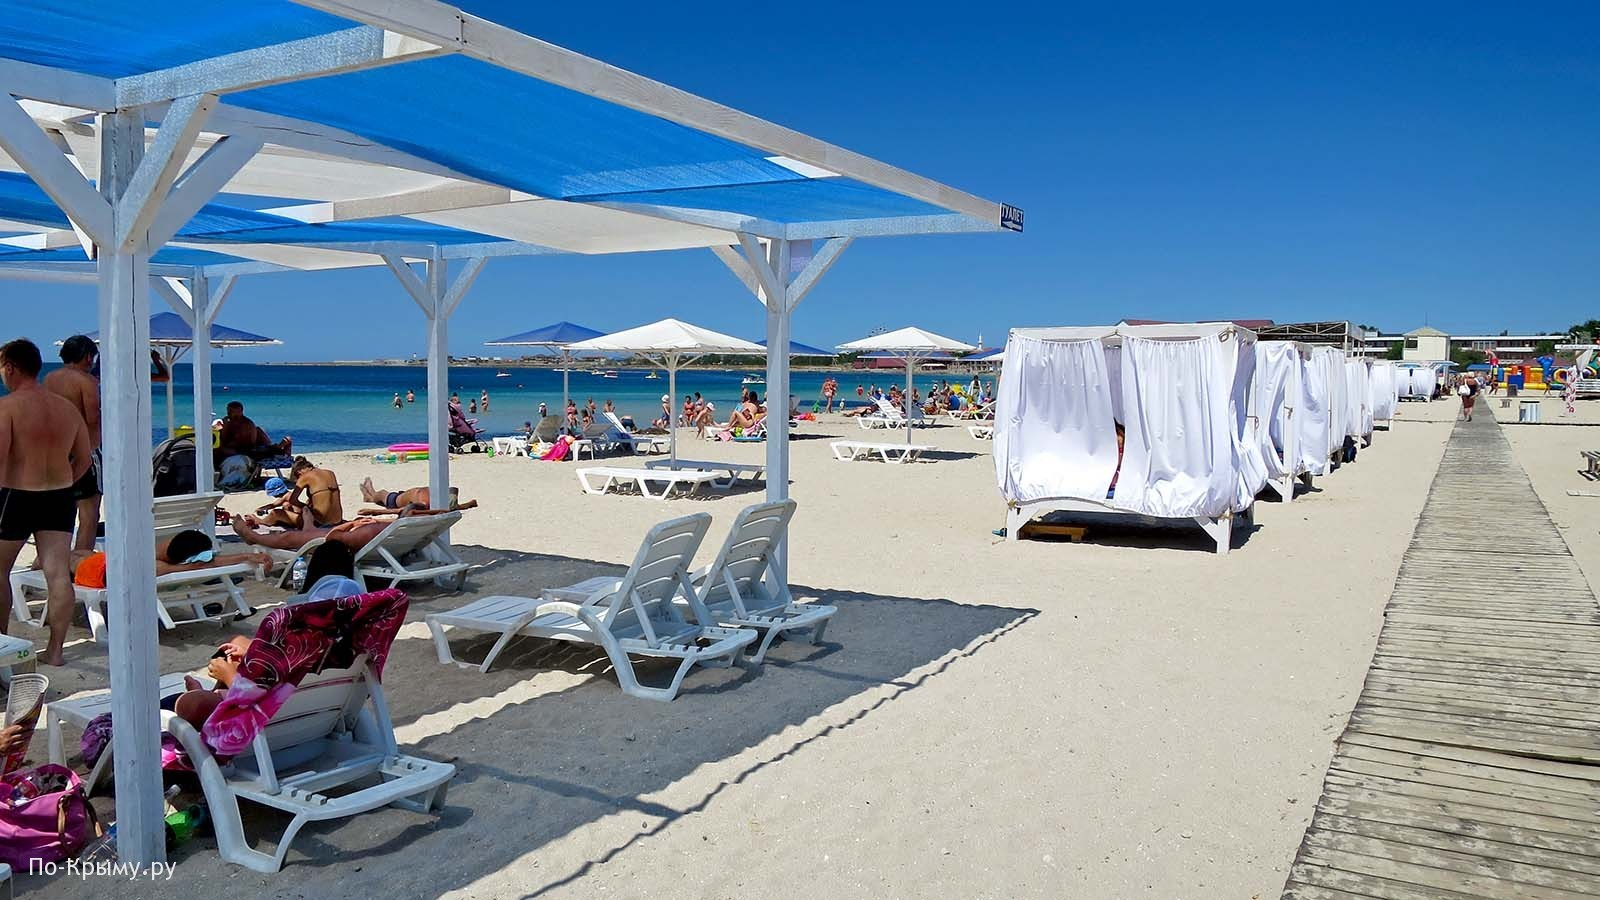 Пляж «Плюс», цены